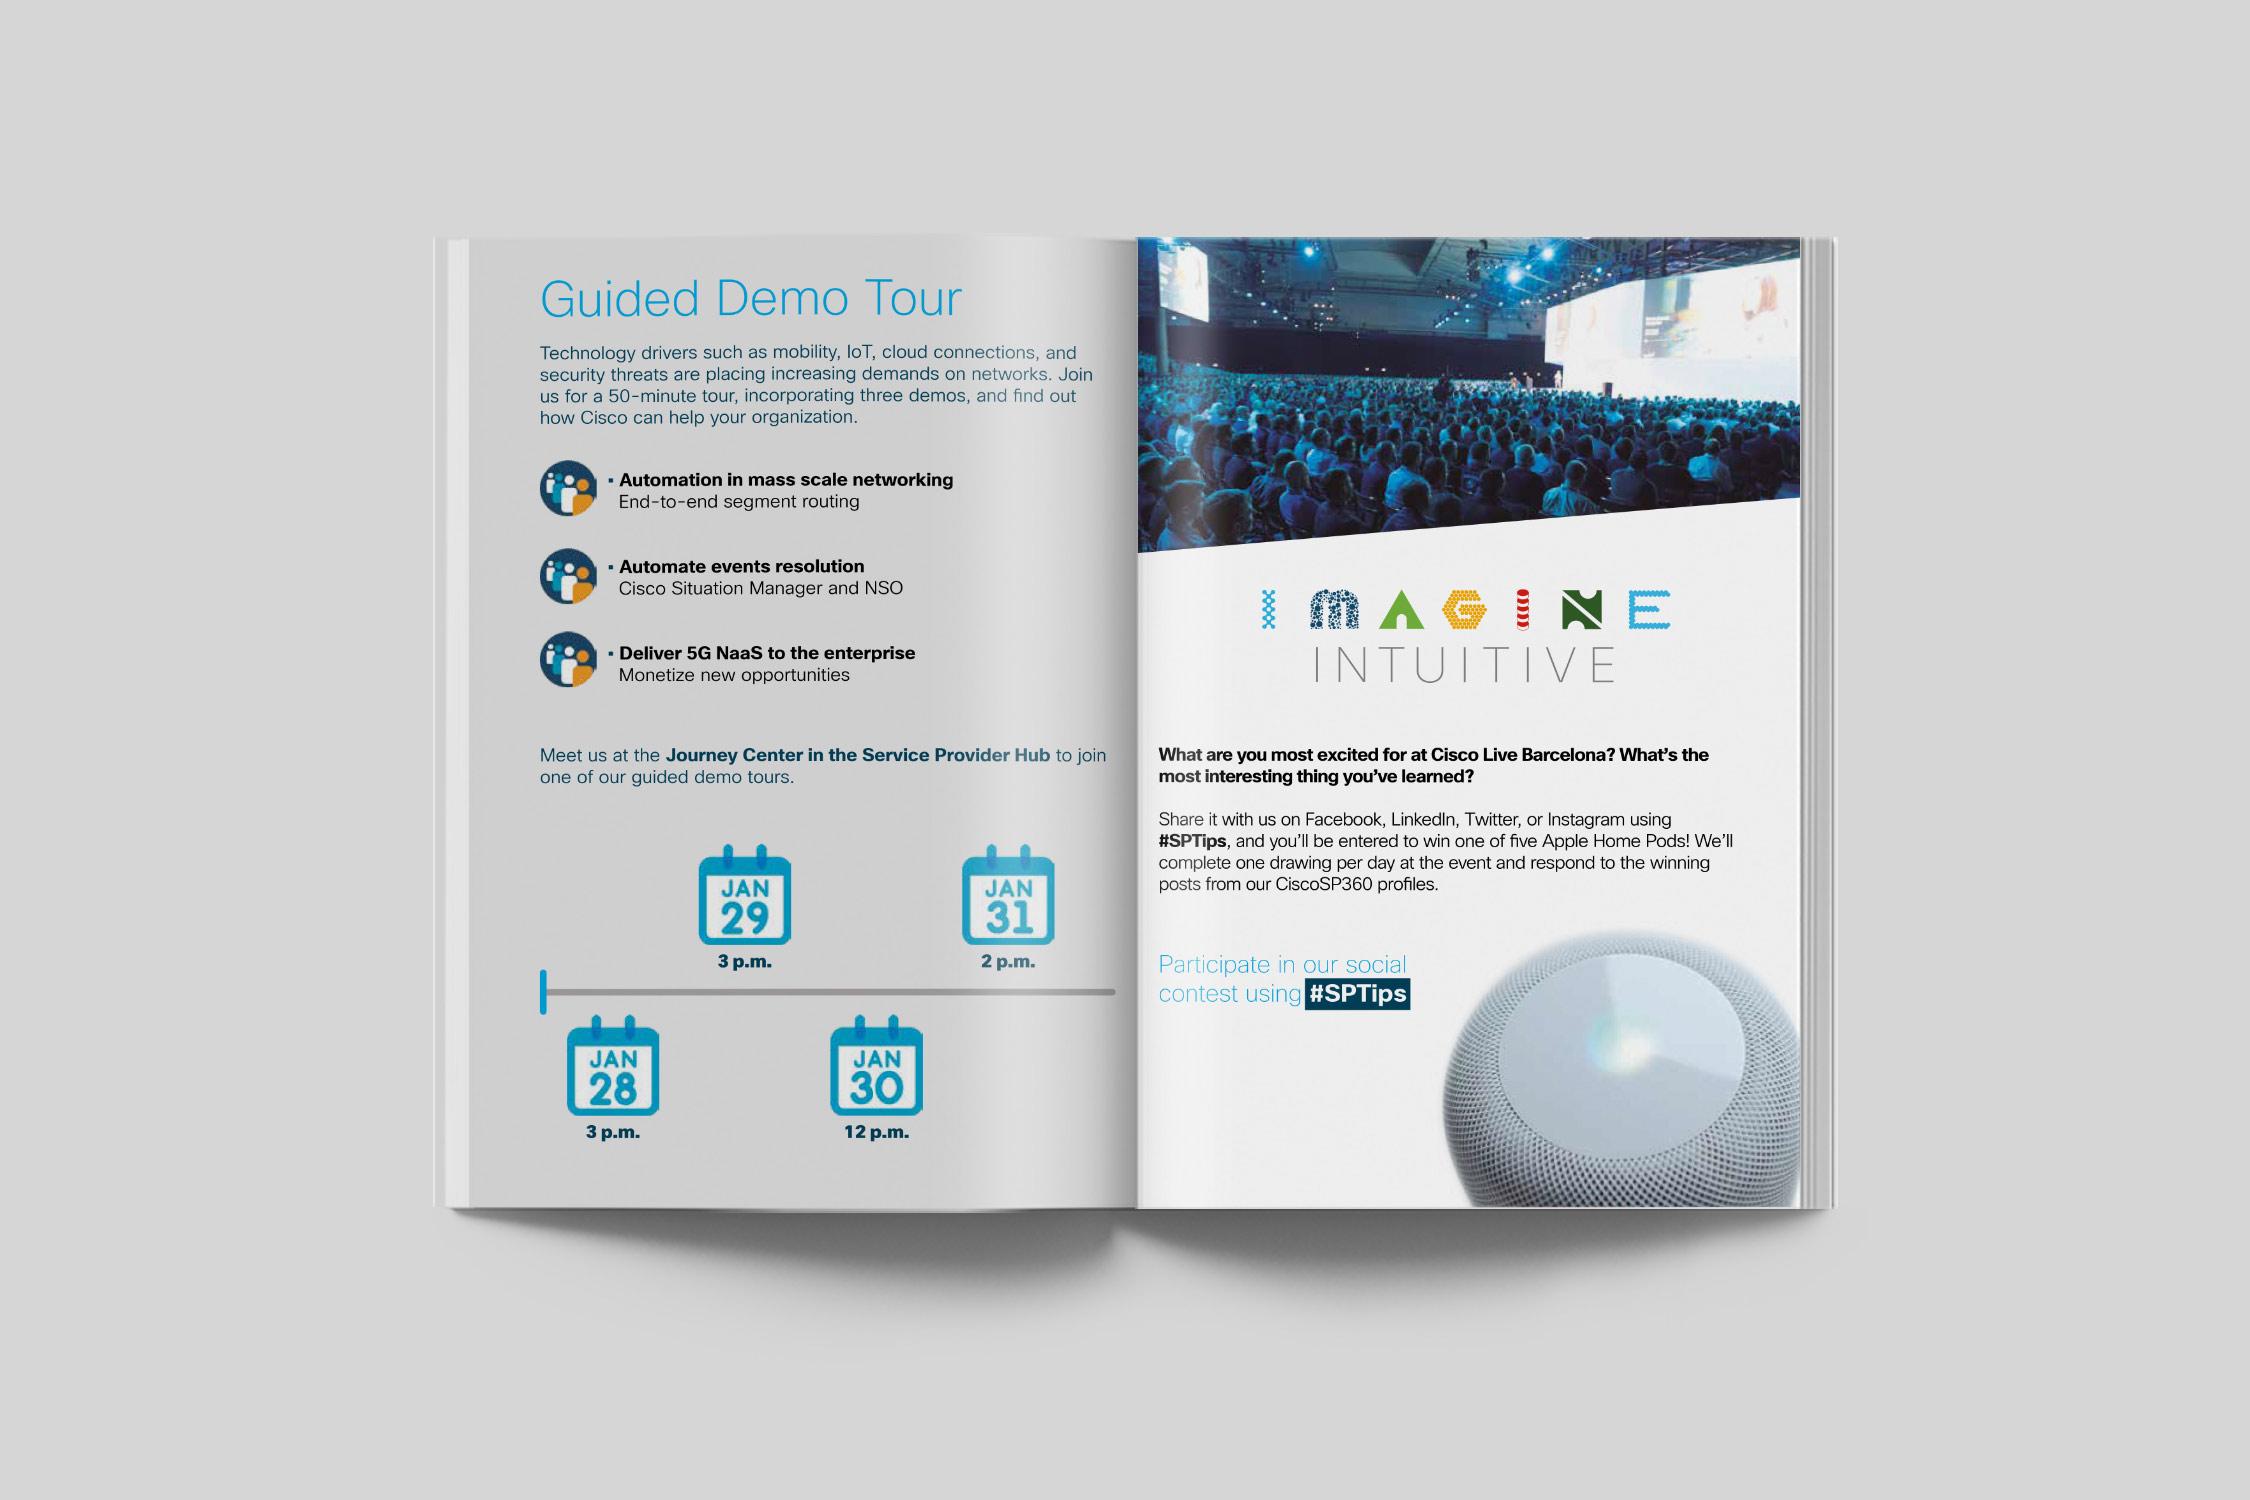 Agenda Cisco Live Barcelona 2019